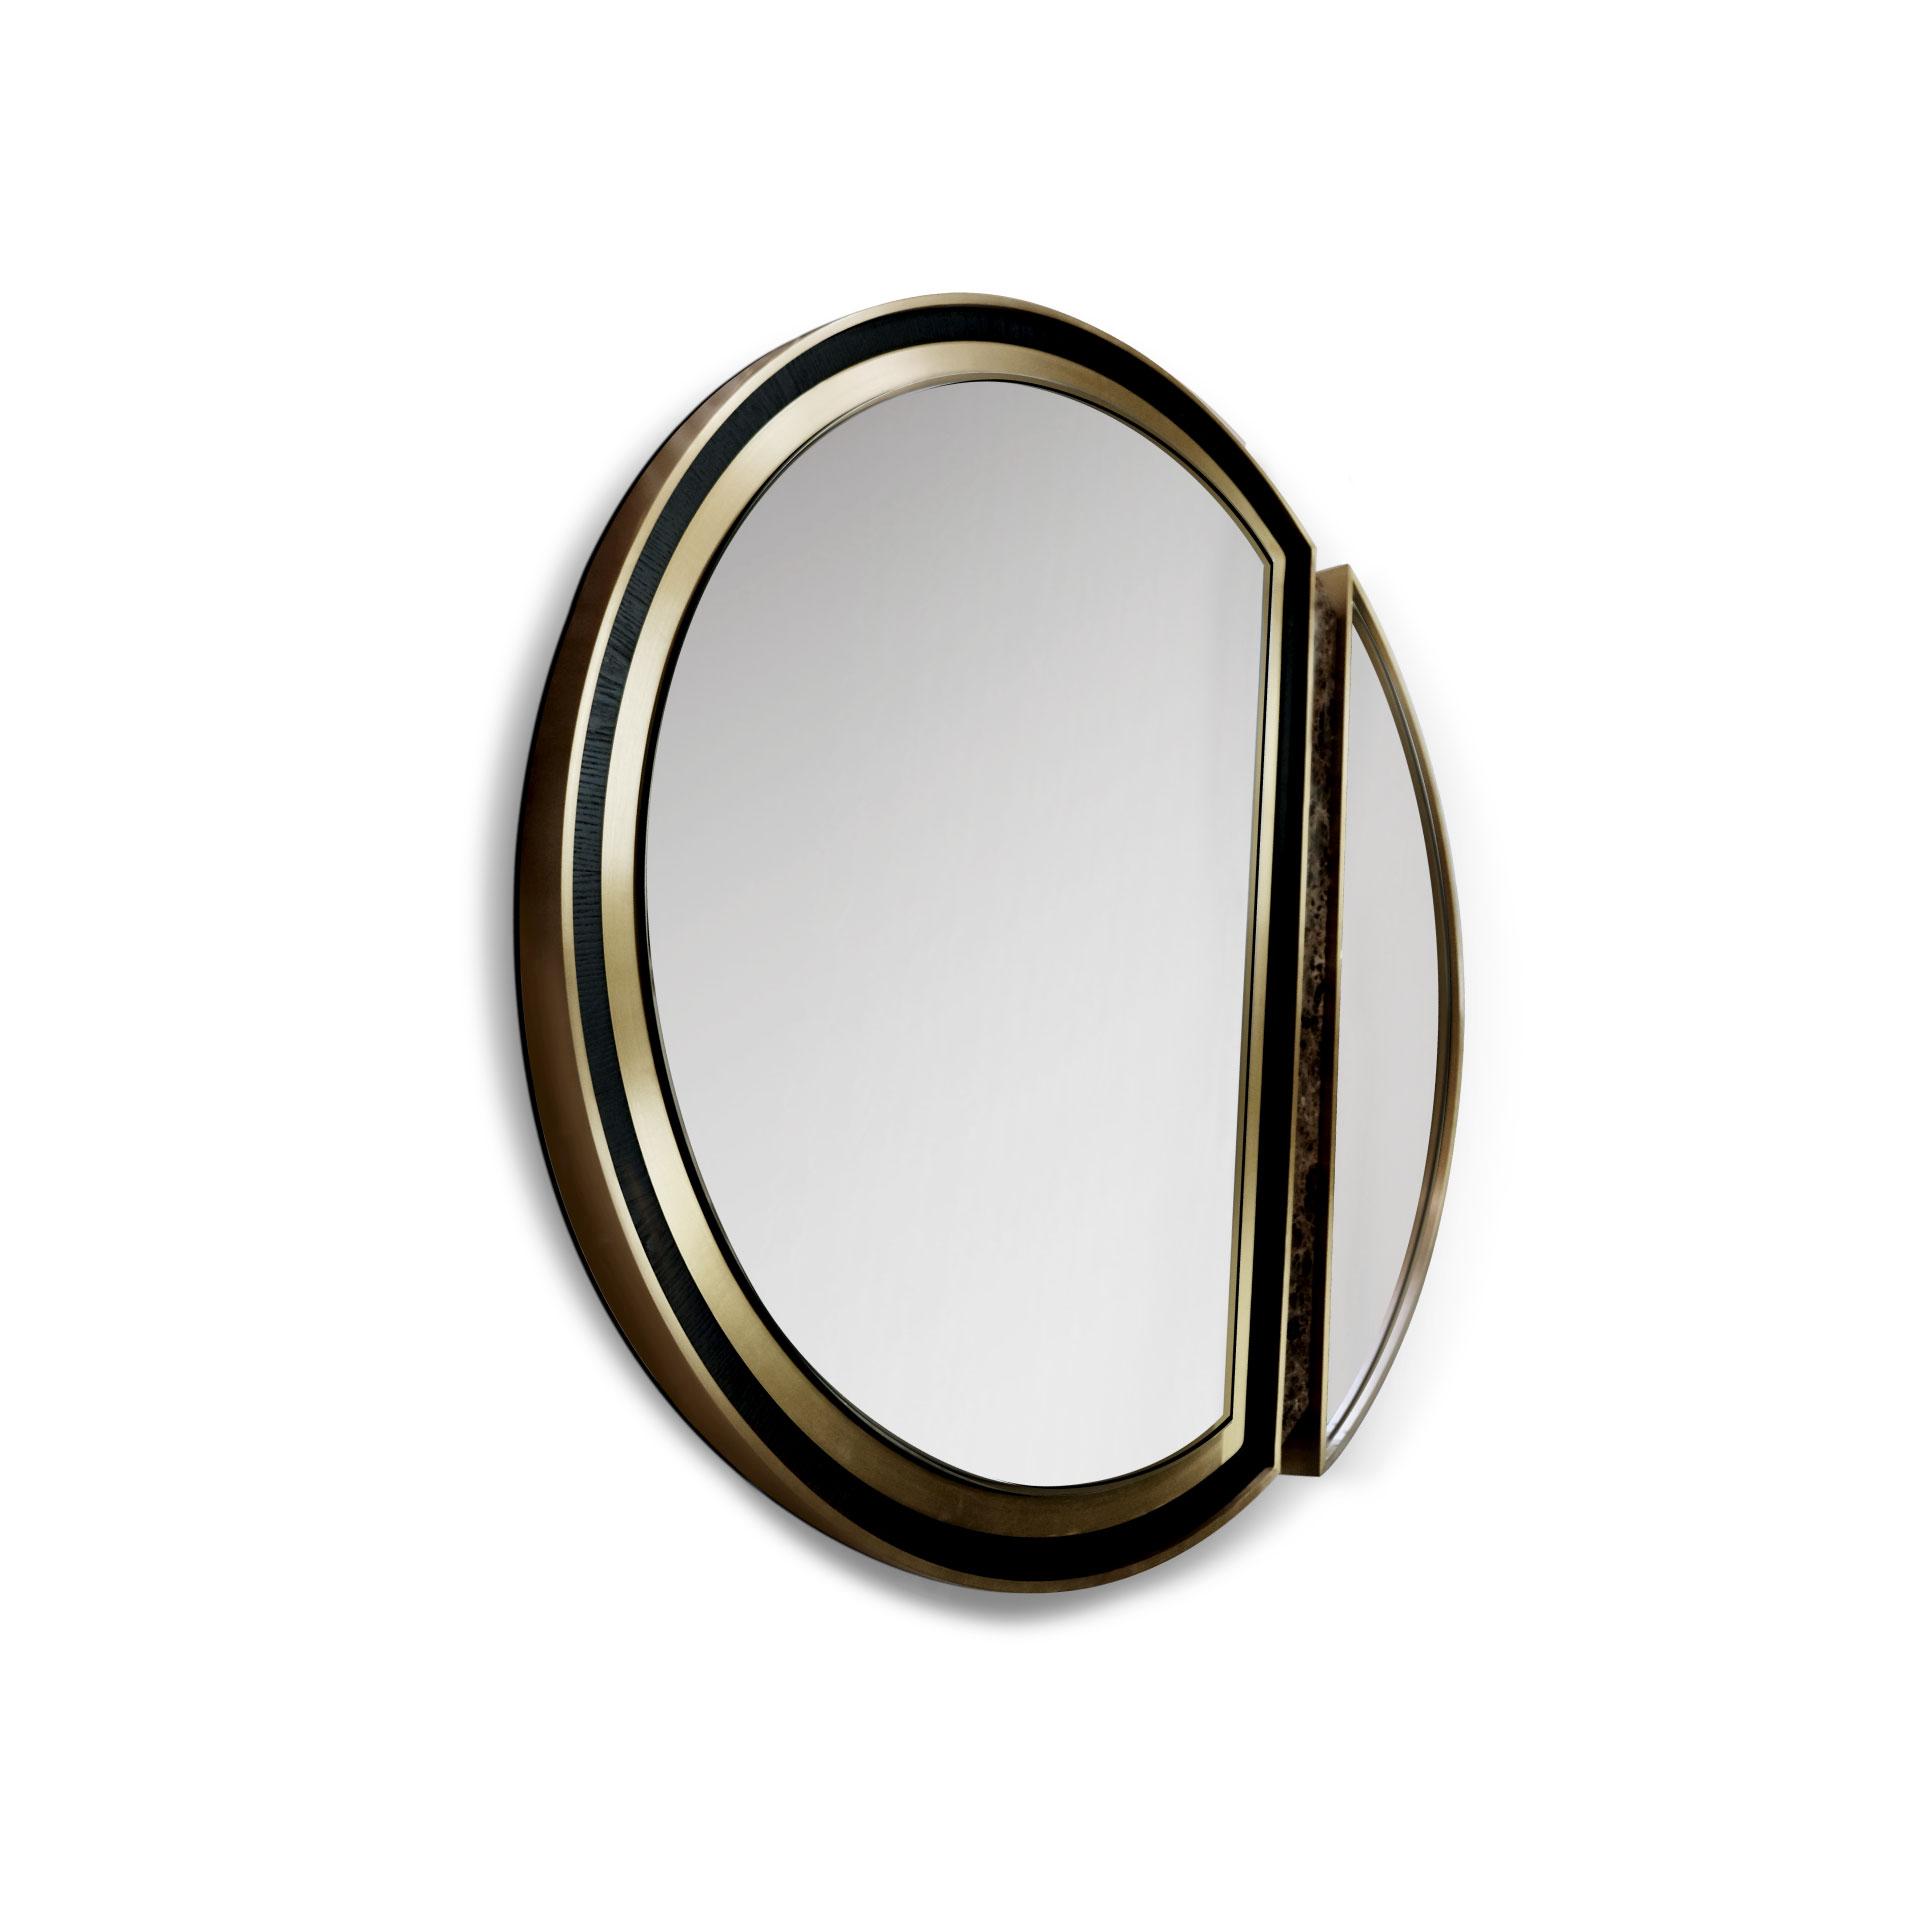 Alaska mirror